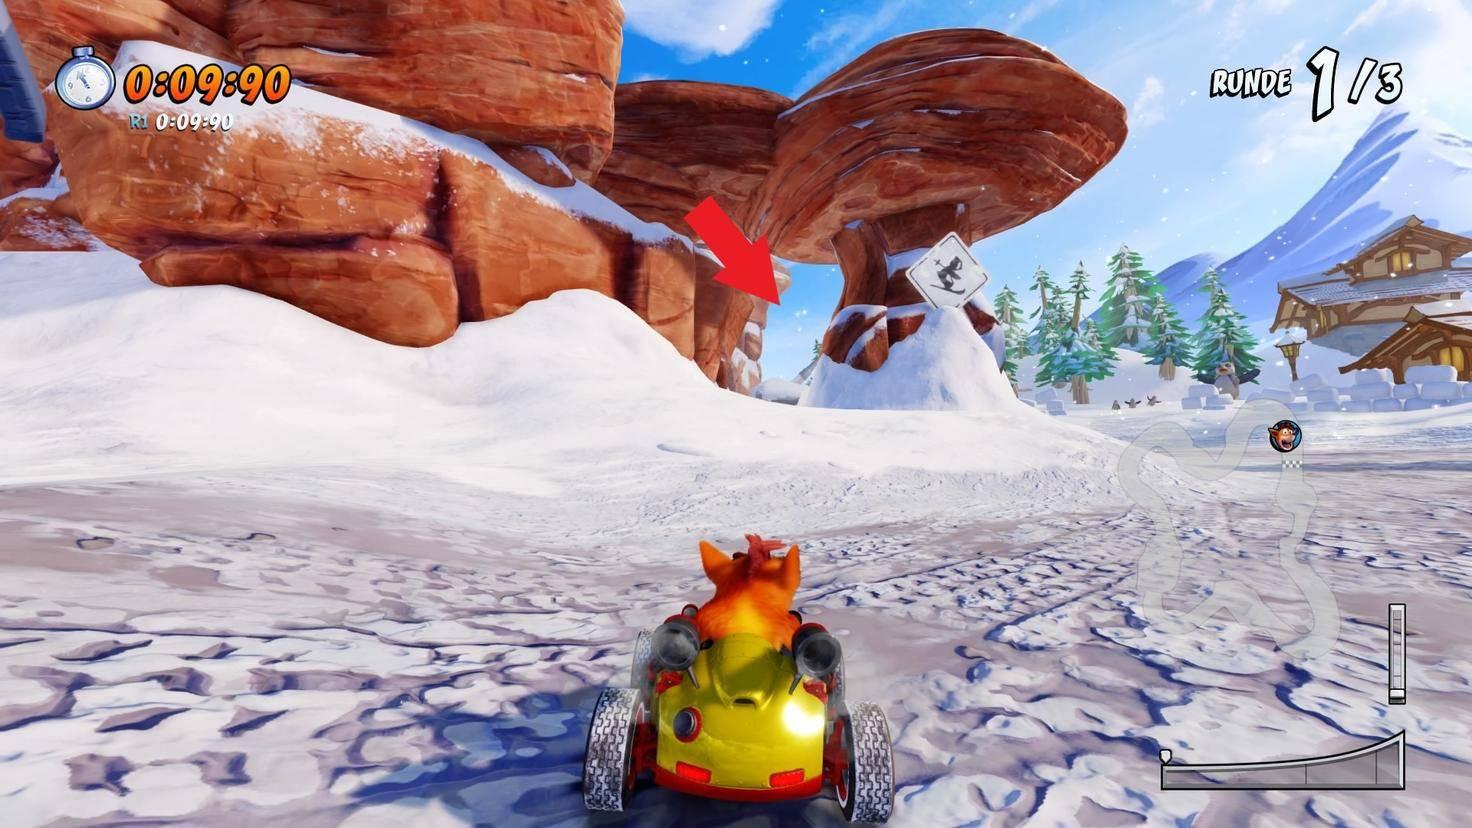 Crash-Team-Racing-Nitro-Fueled-Abkürzung-Blizzard-Bluff-1